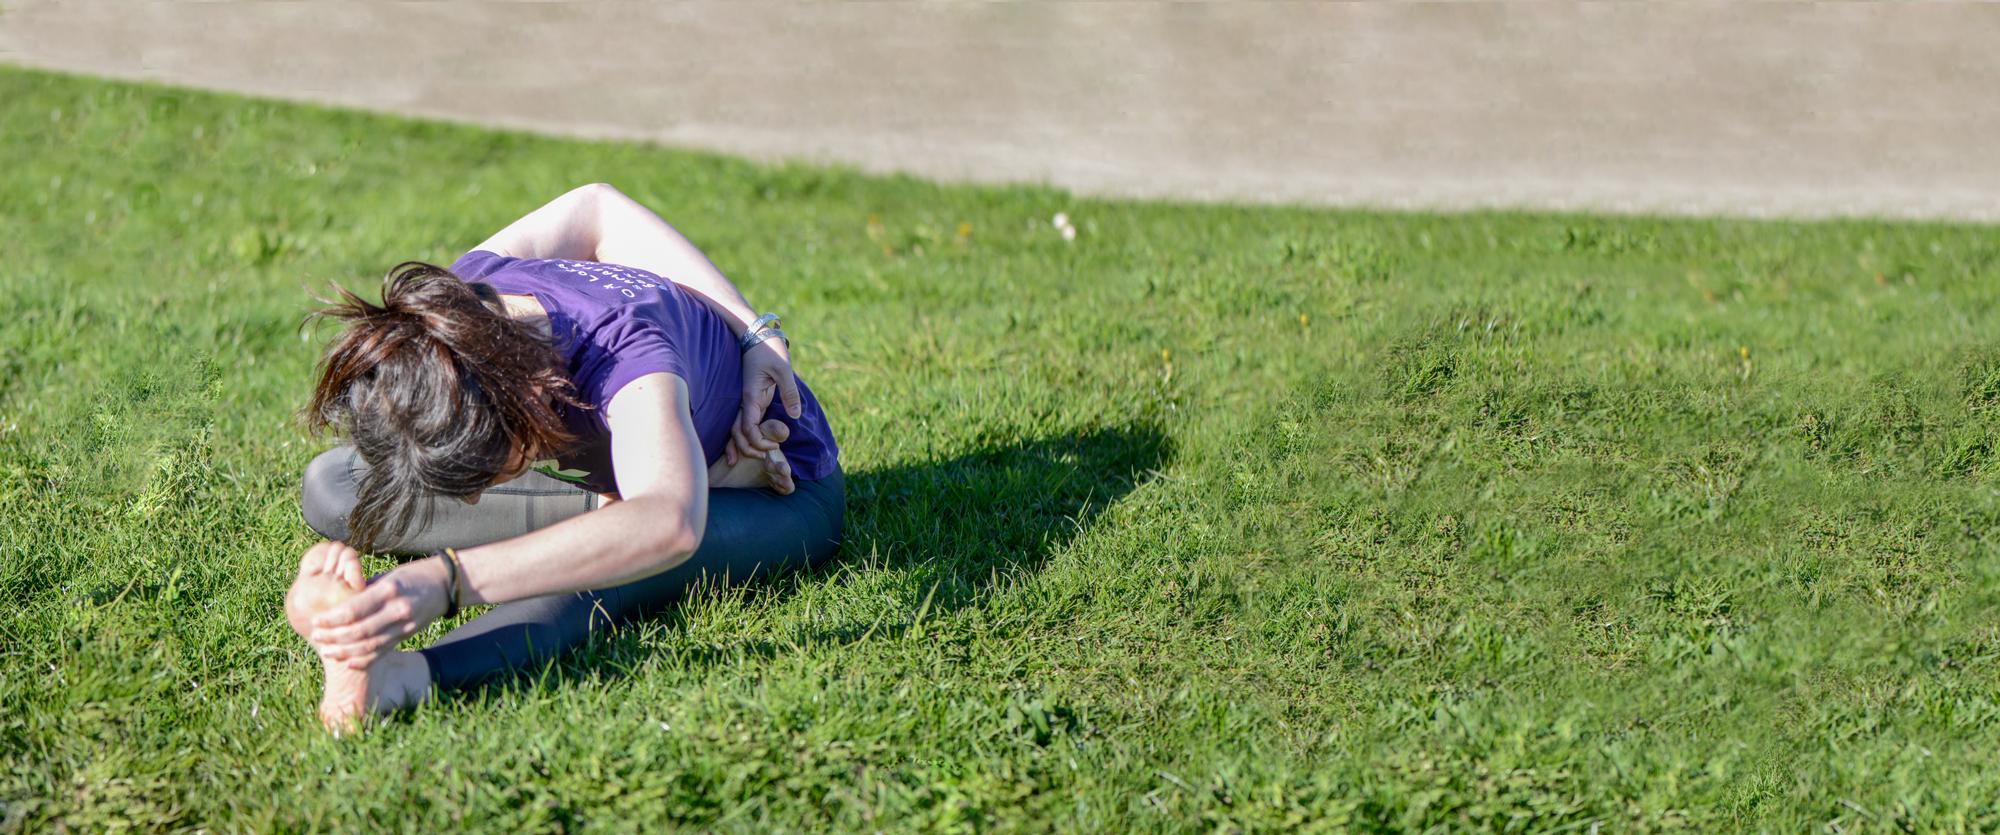 viva-yoga-posture-nature